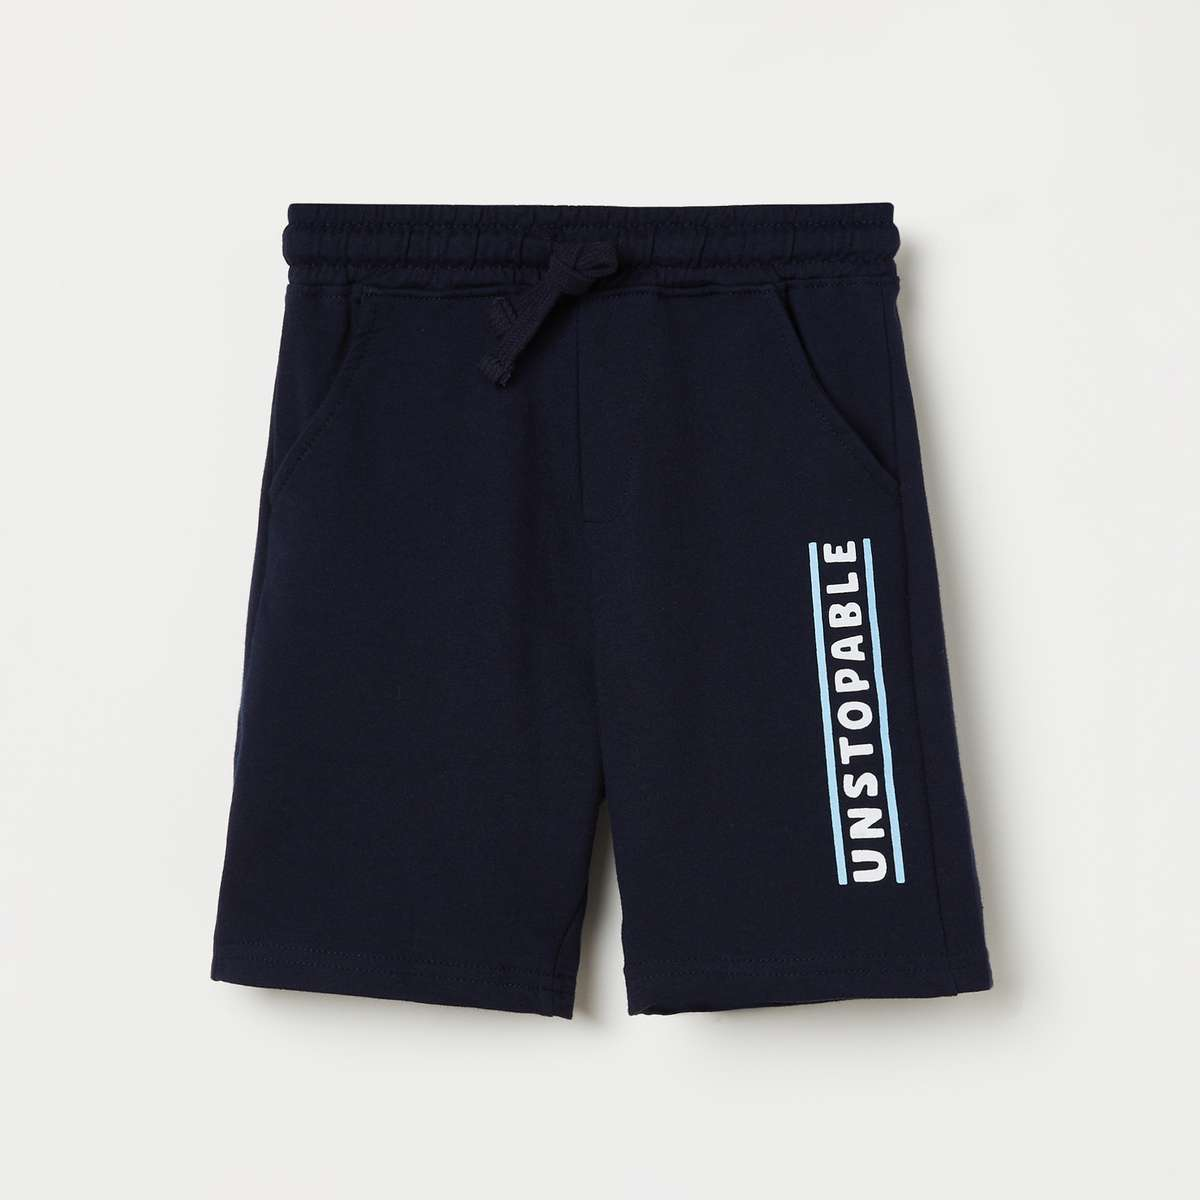 7.FAME FOREVER KIDS Boys Printed Elasticated Shorts